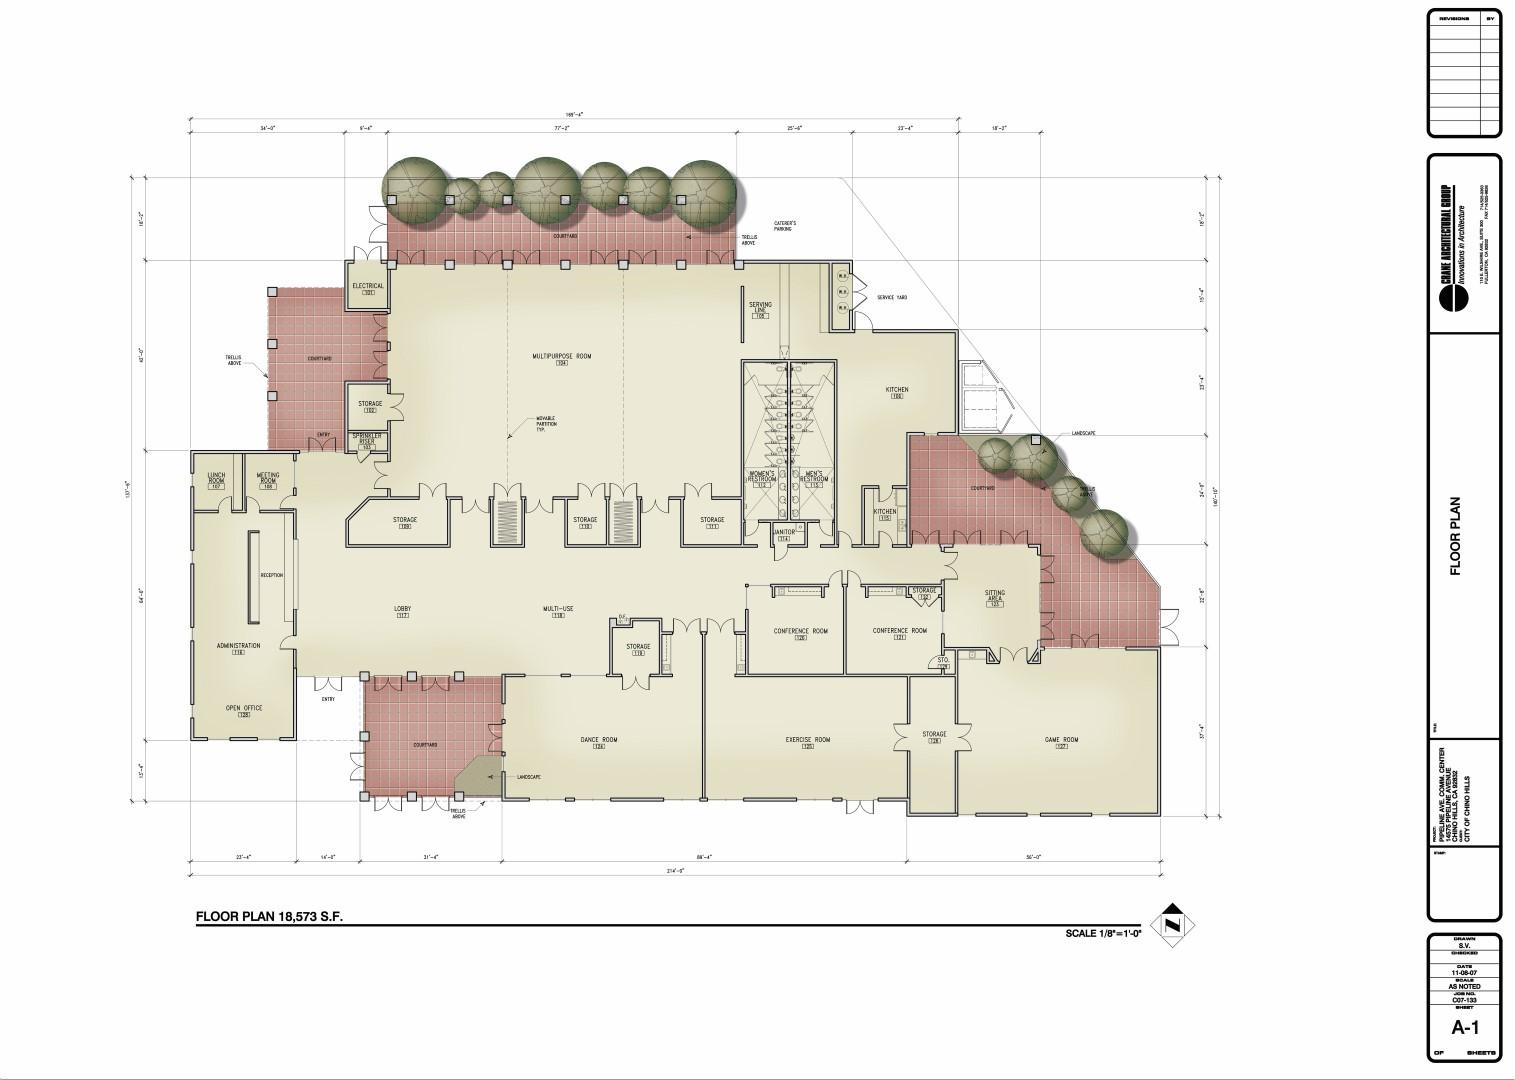 A-01 Floor Plan